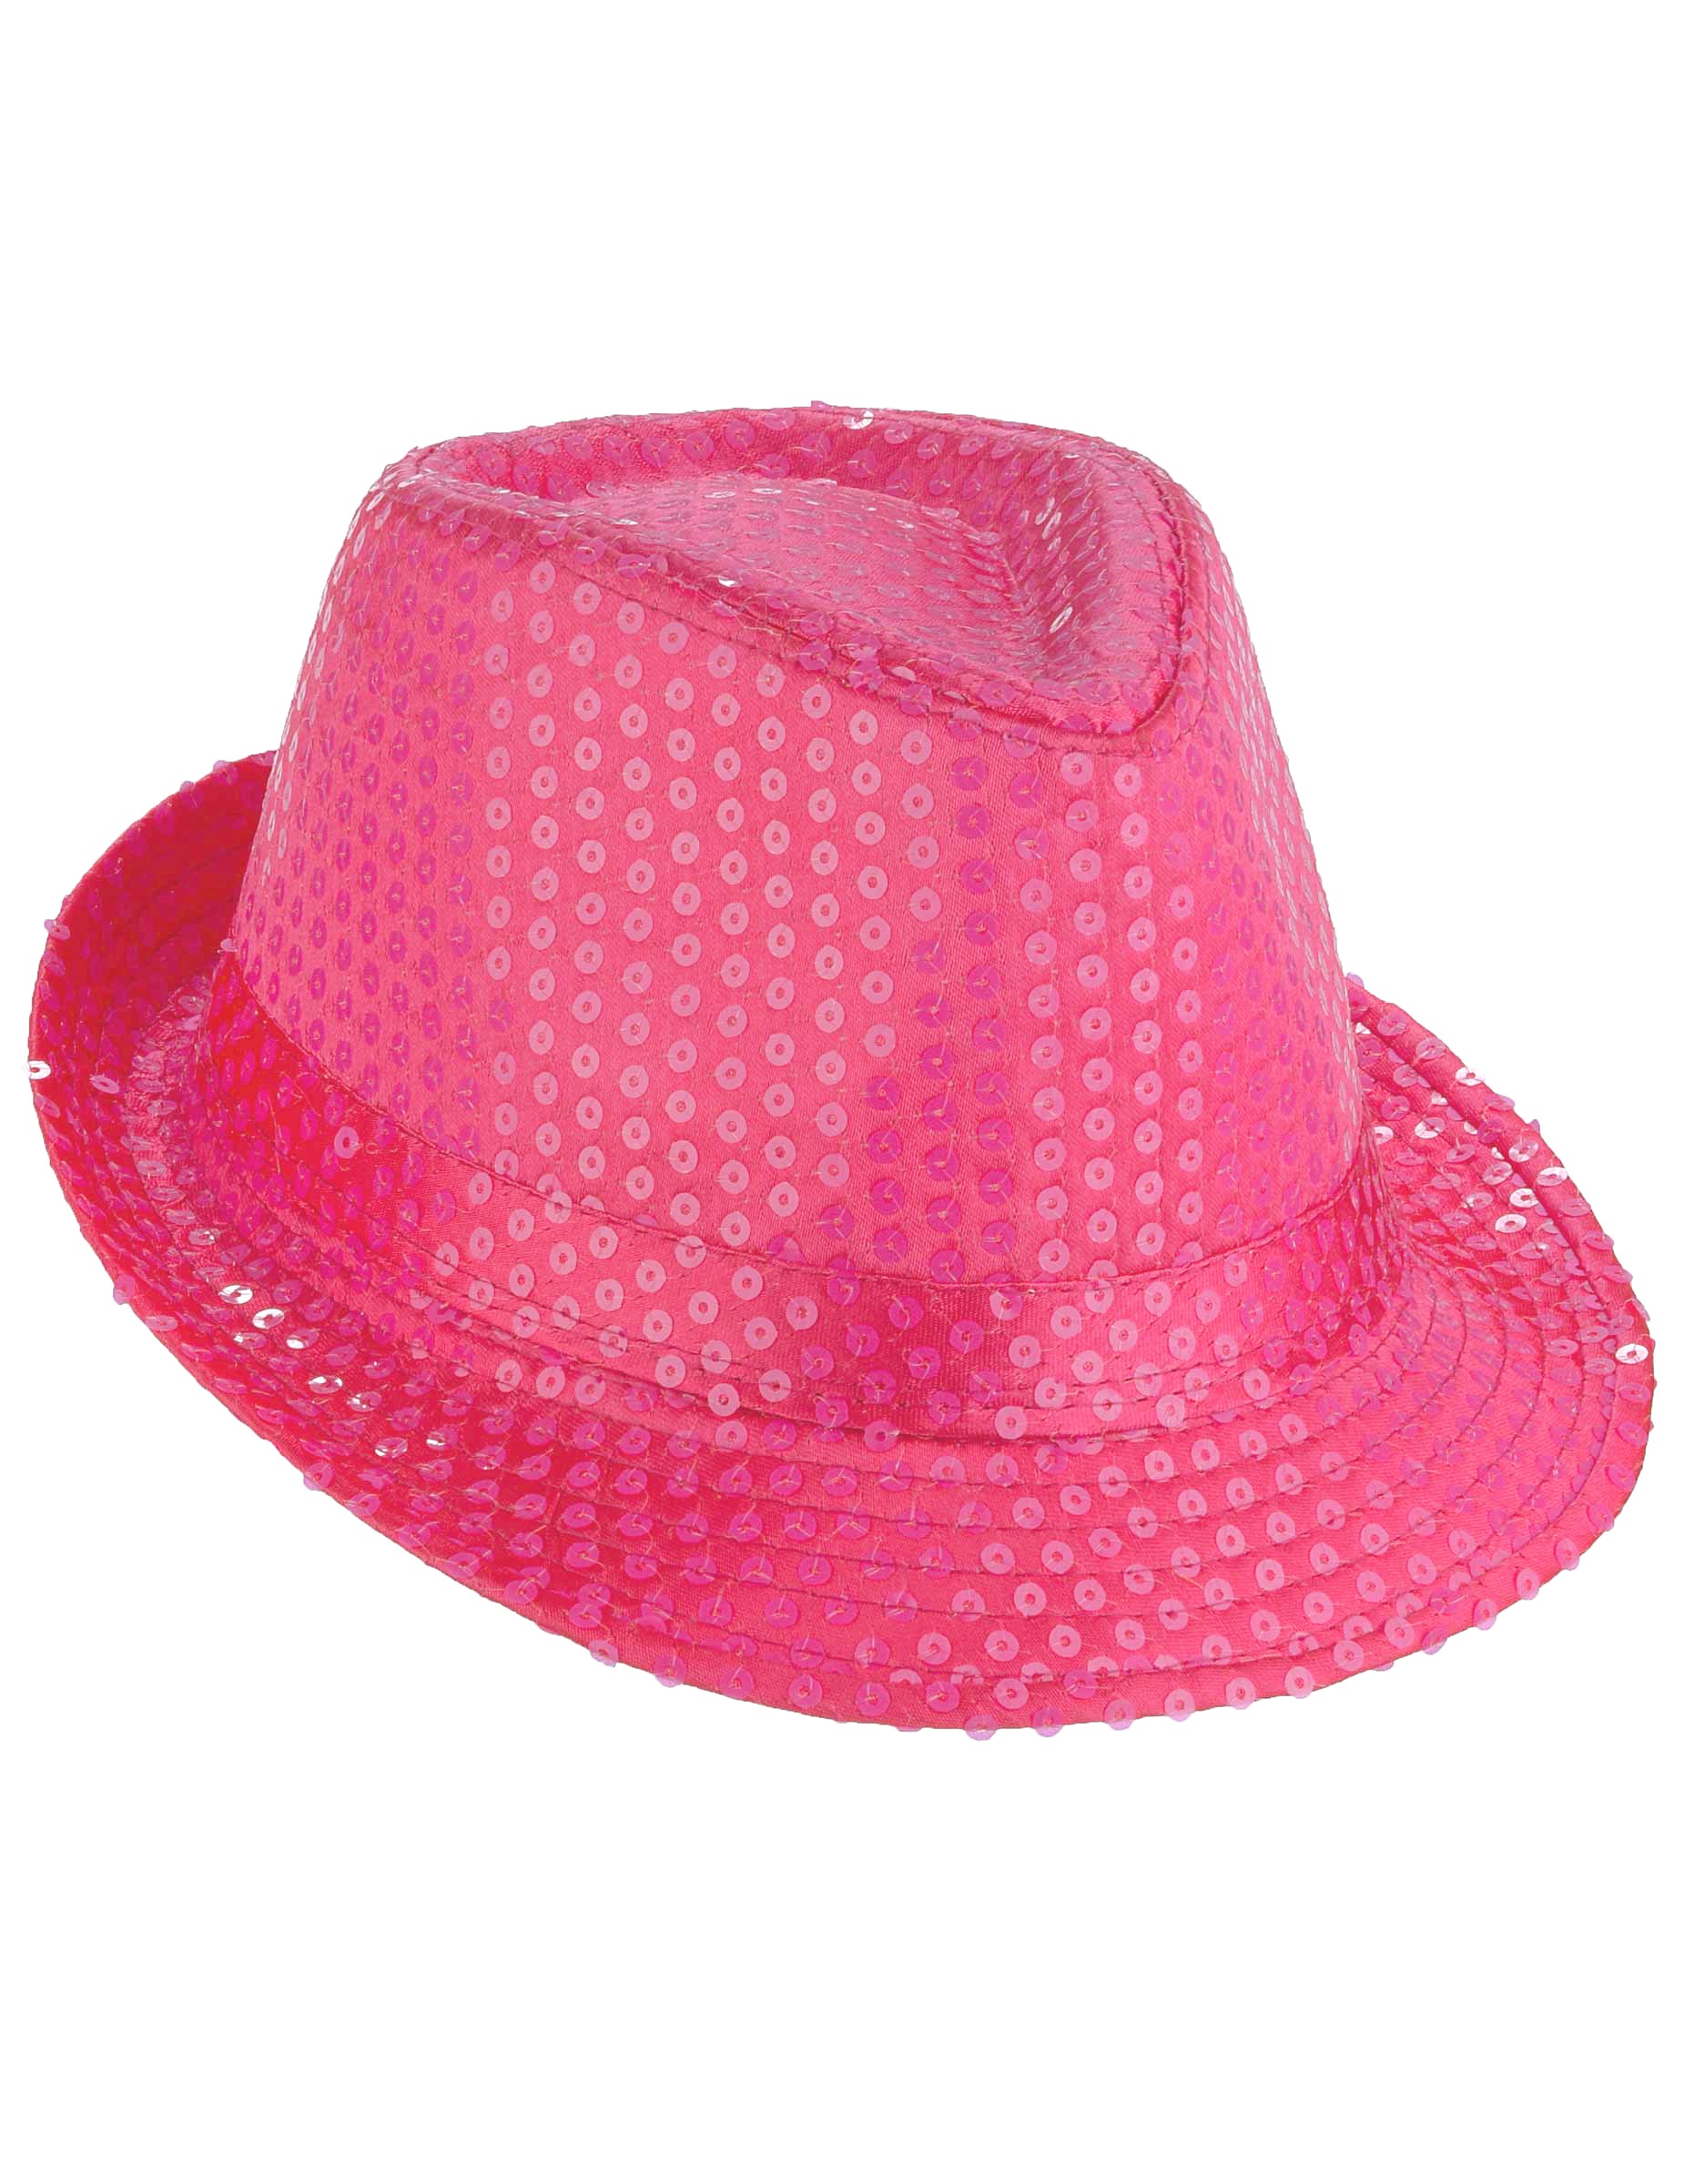 Sombrero borsalino lentejuelas rosa fluorescente adulto  Sombreros 789d7def95b